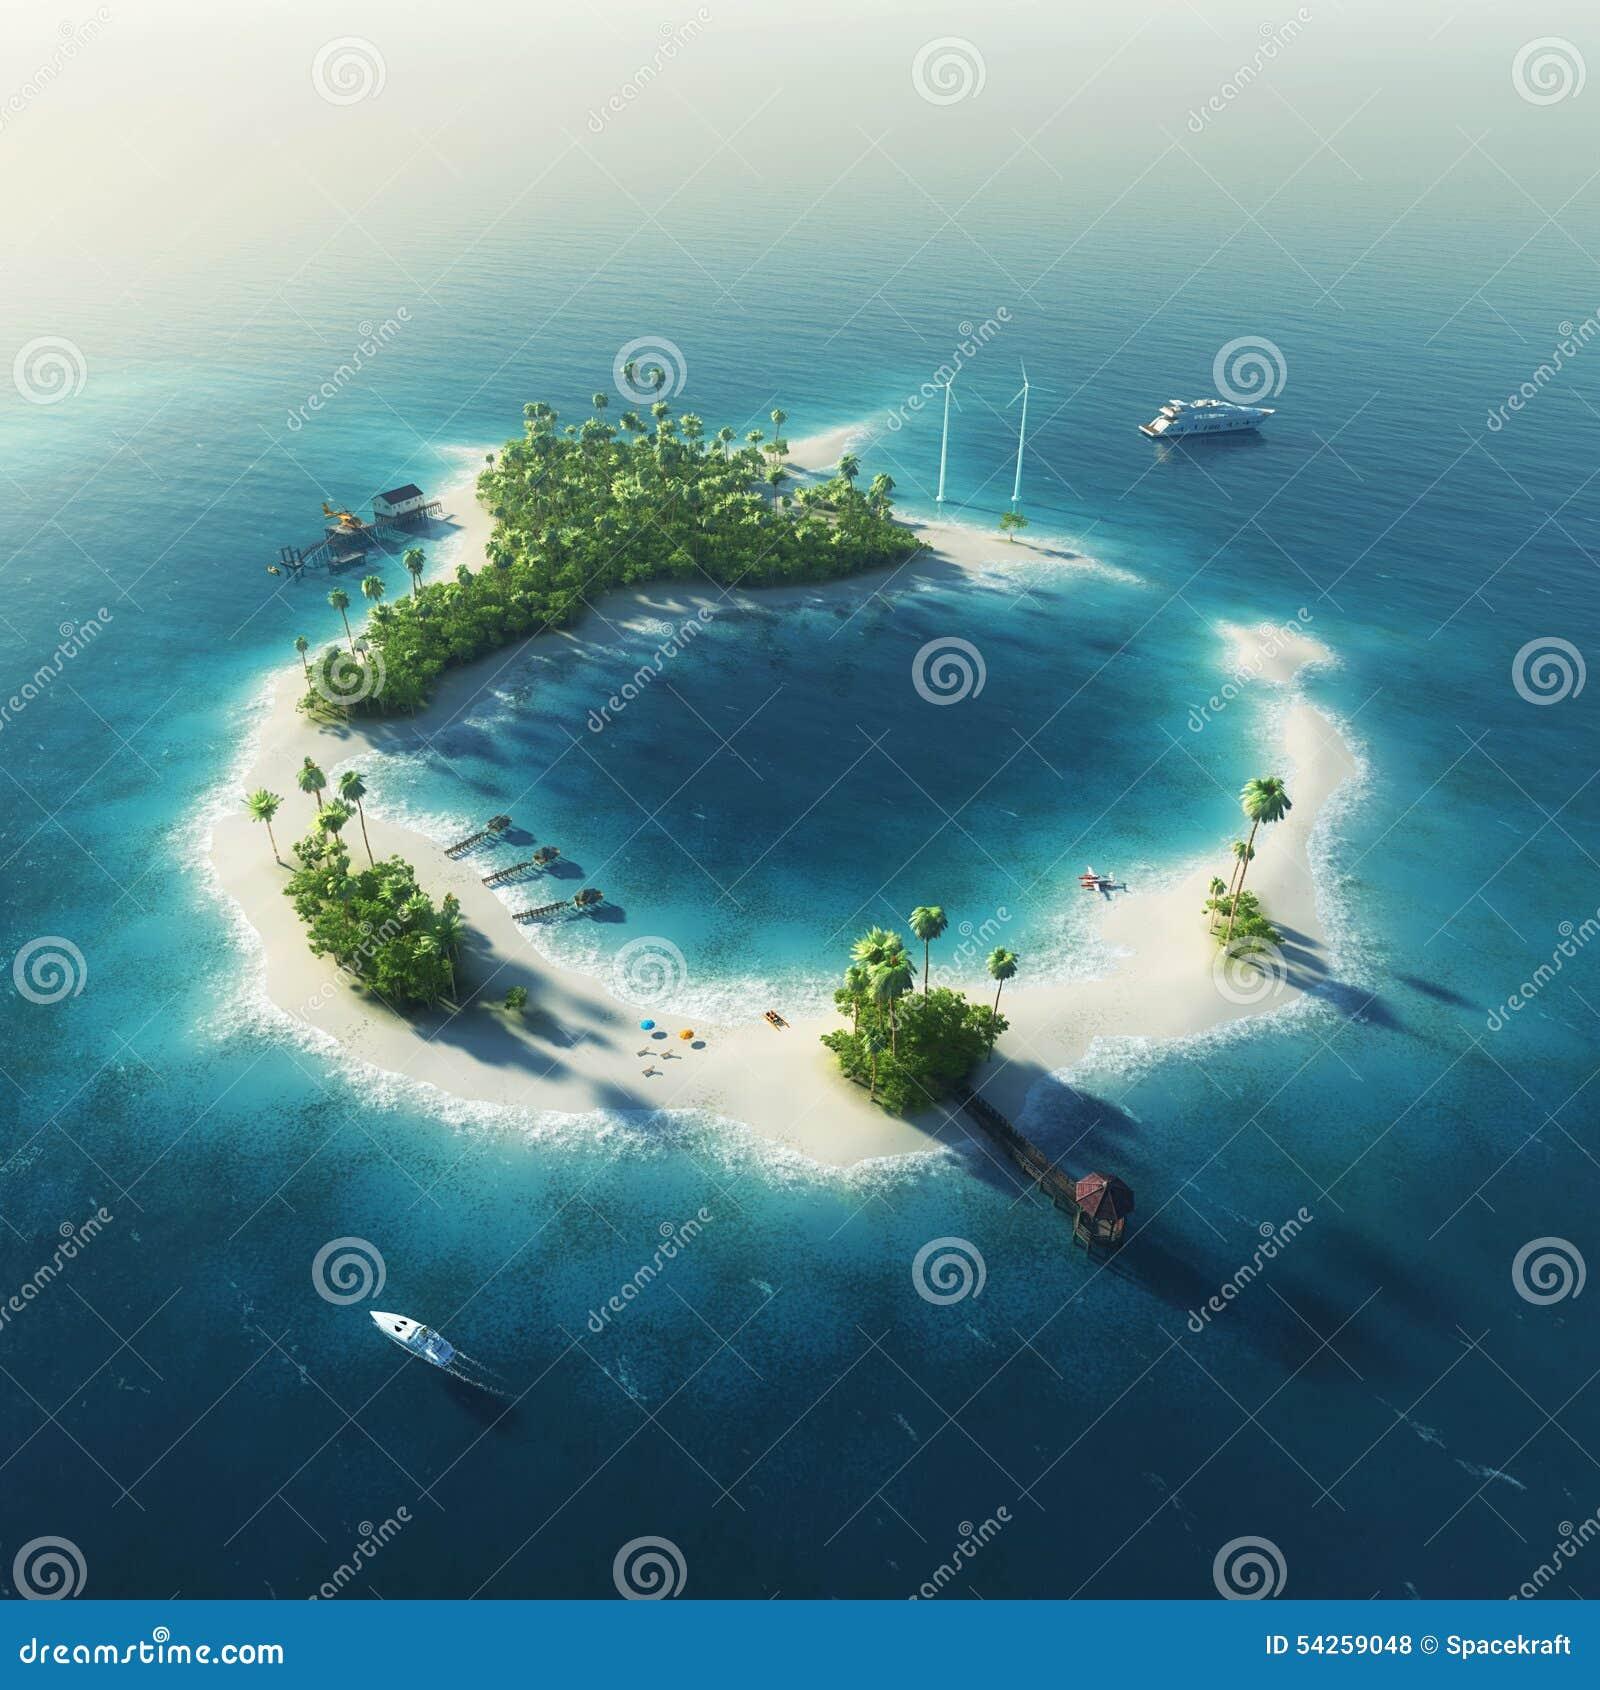 Private Island Beaches: Private Island. Paradise Summer Tropical Island Stock